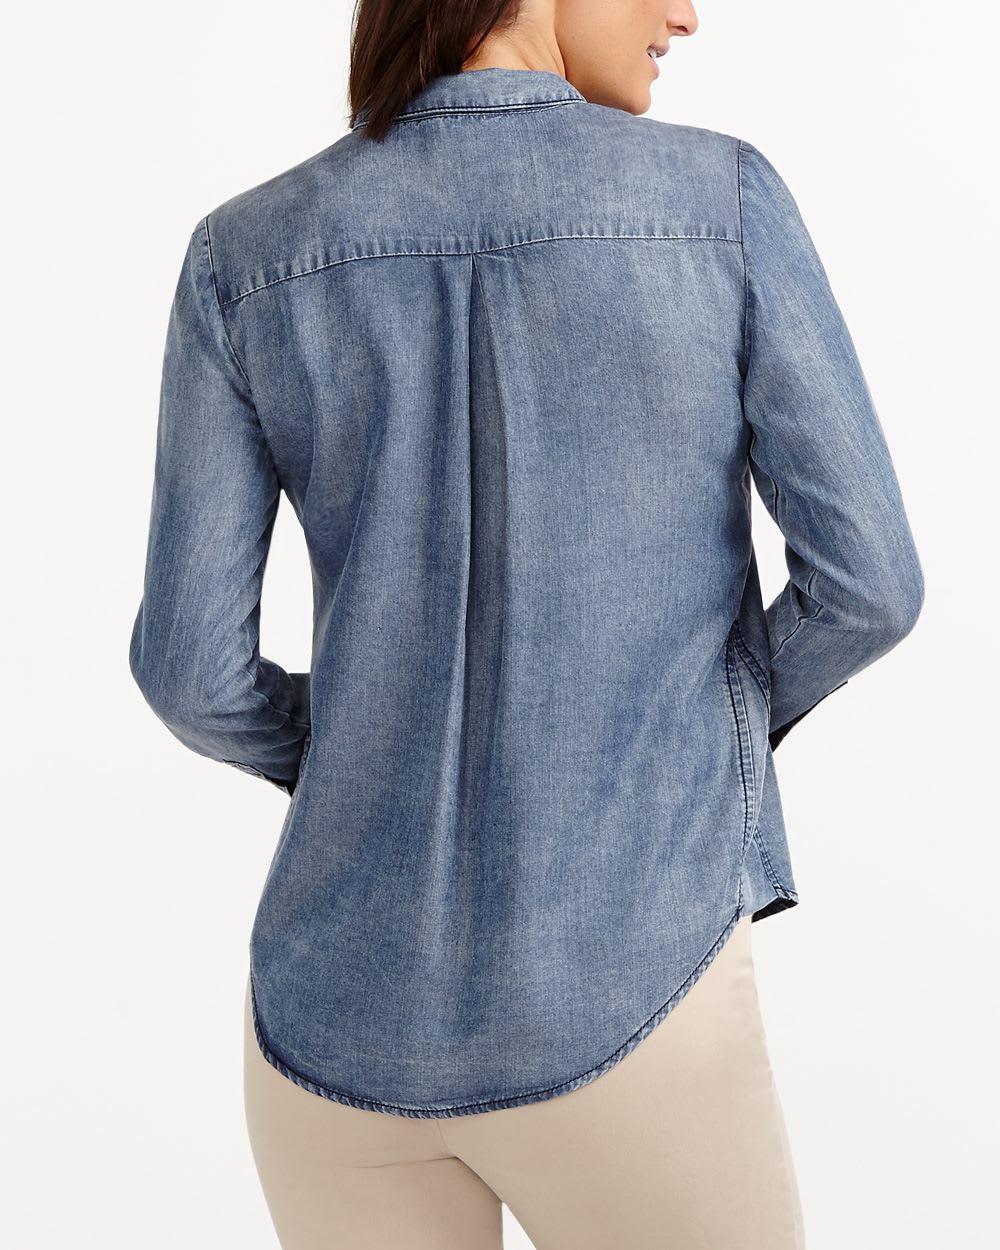 6645bfded7f Denim Long Sleeve Shirt Womens - Nils Stucki Kieferorthopäde